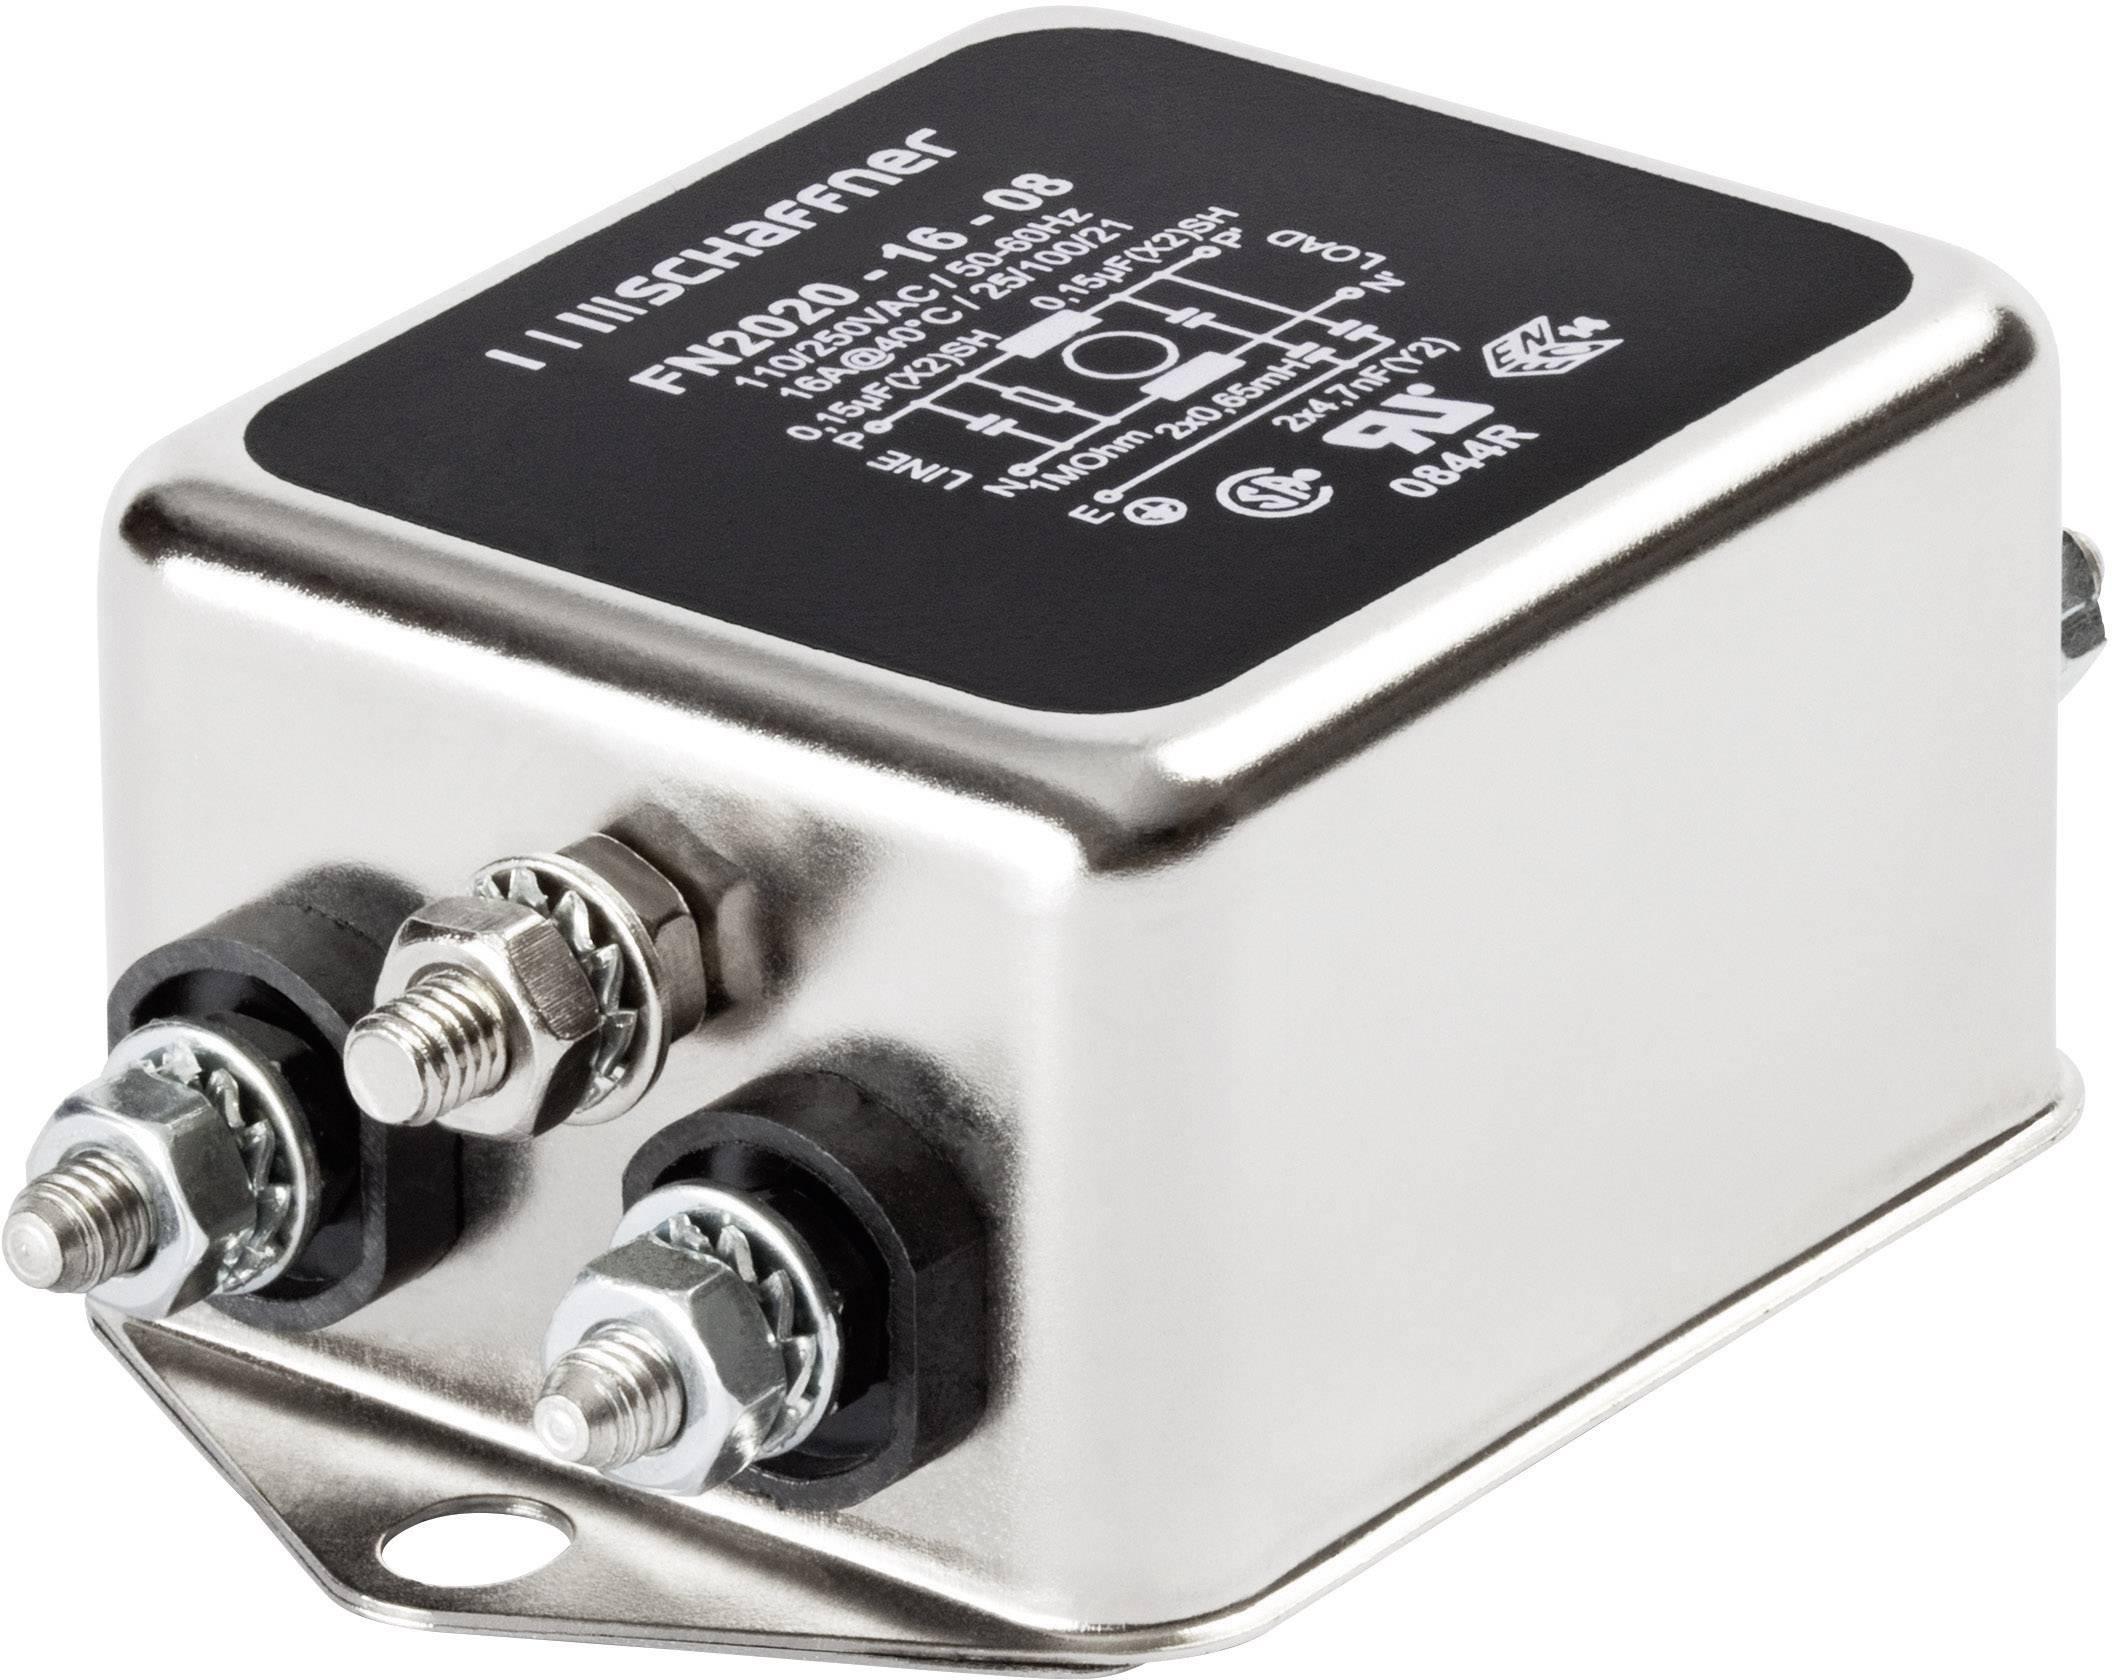 Odrušovací filter Schaffner FN 2020-16-06 FN 2020-16-06, 250 V/AC, 16 A, 0.65 mH, (š x v) 71 mm x 29.3 mm, 1 ks